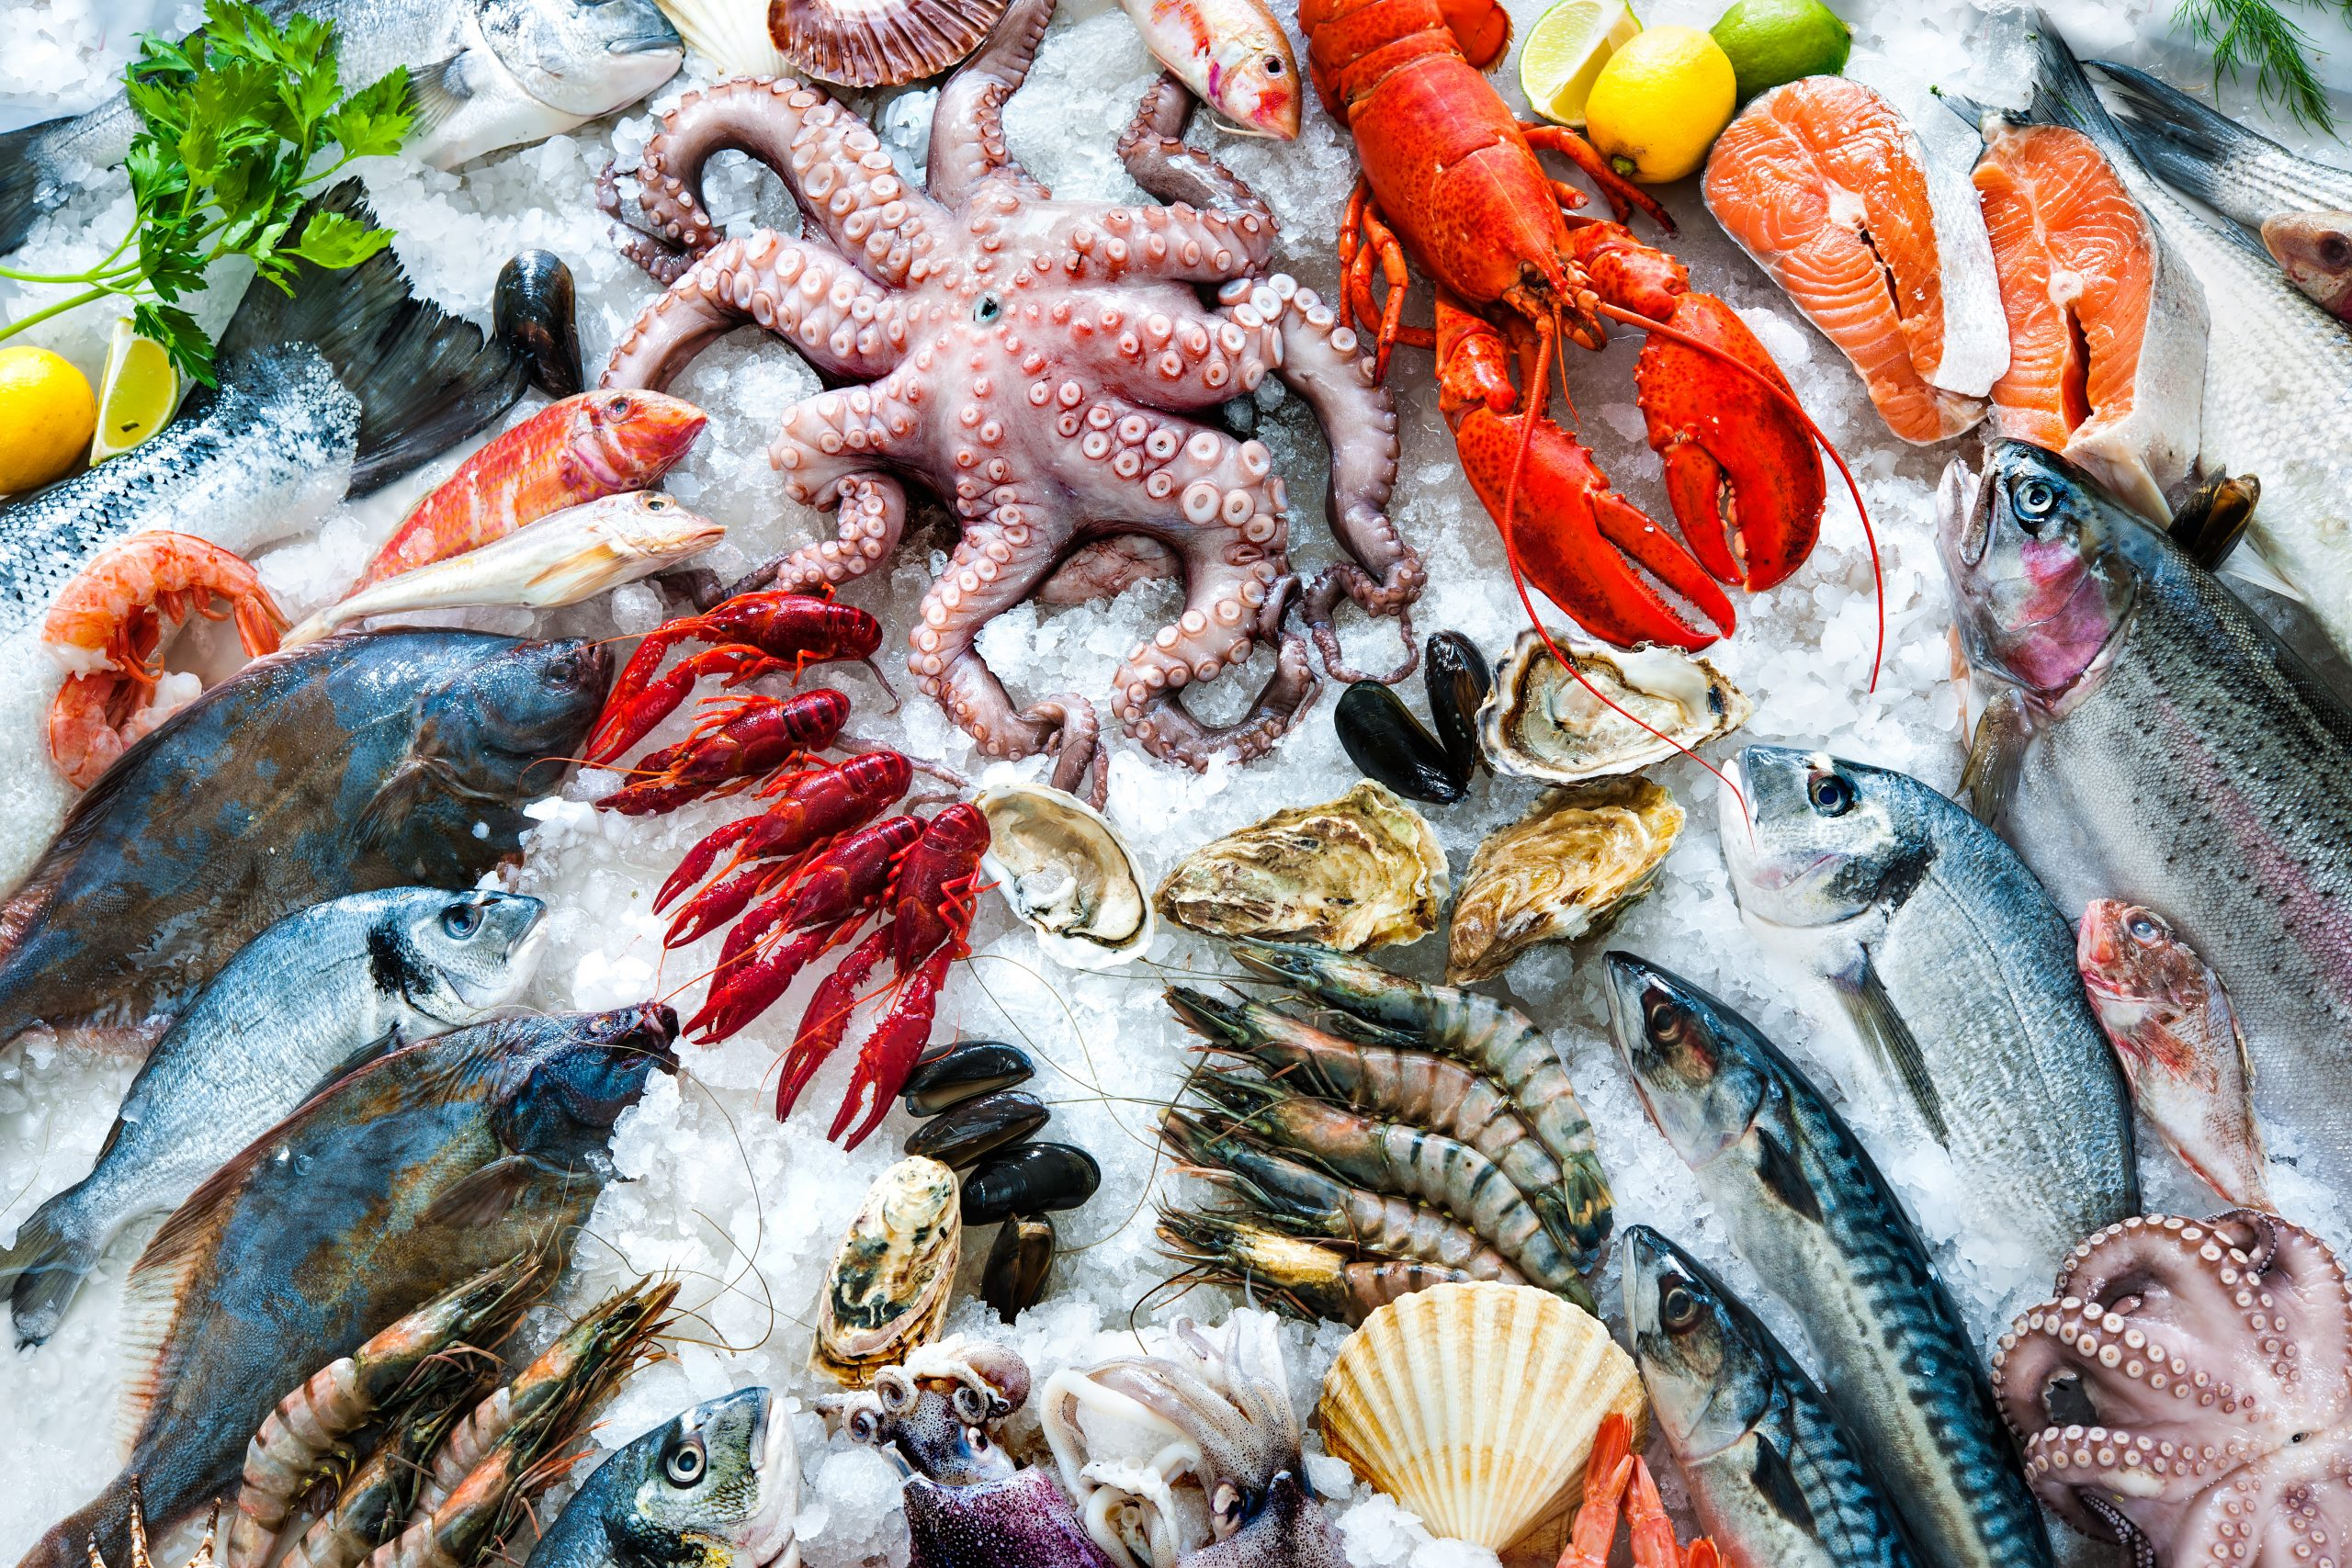 Pesce freschissimo Ristorante di Pesce Tropea